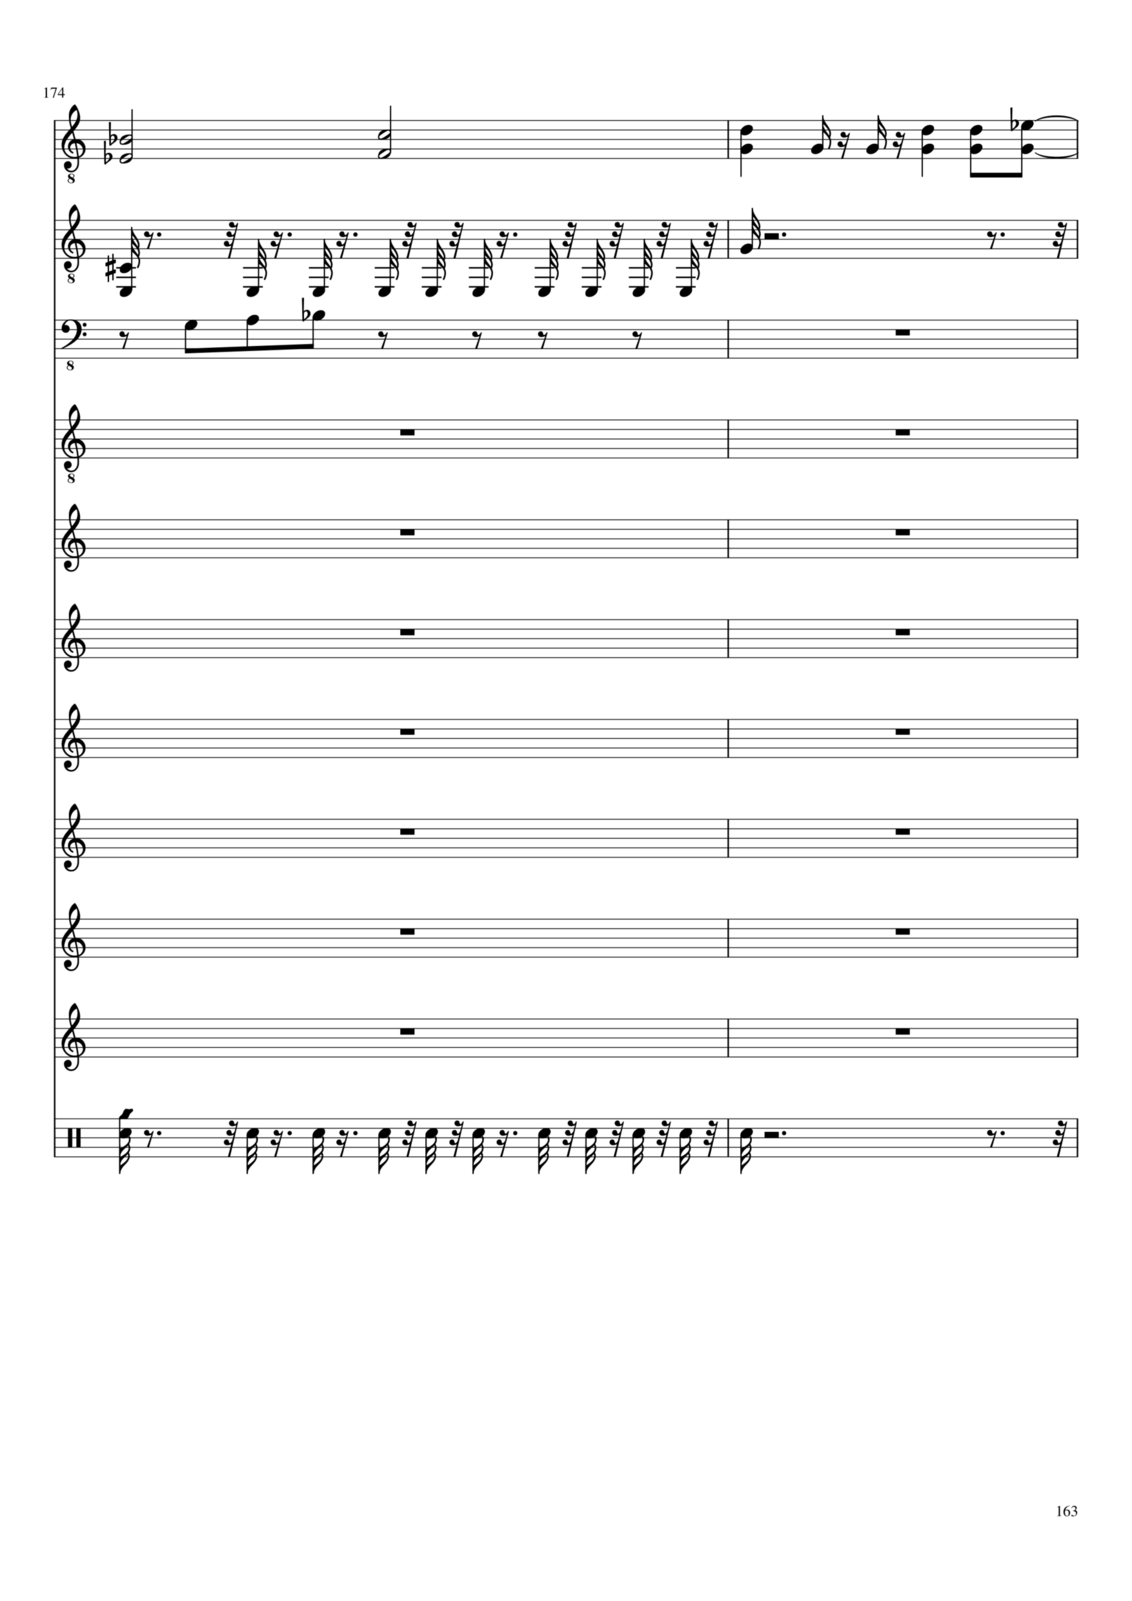 Belyiy sokol slide, Image 163